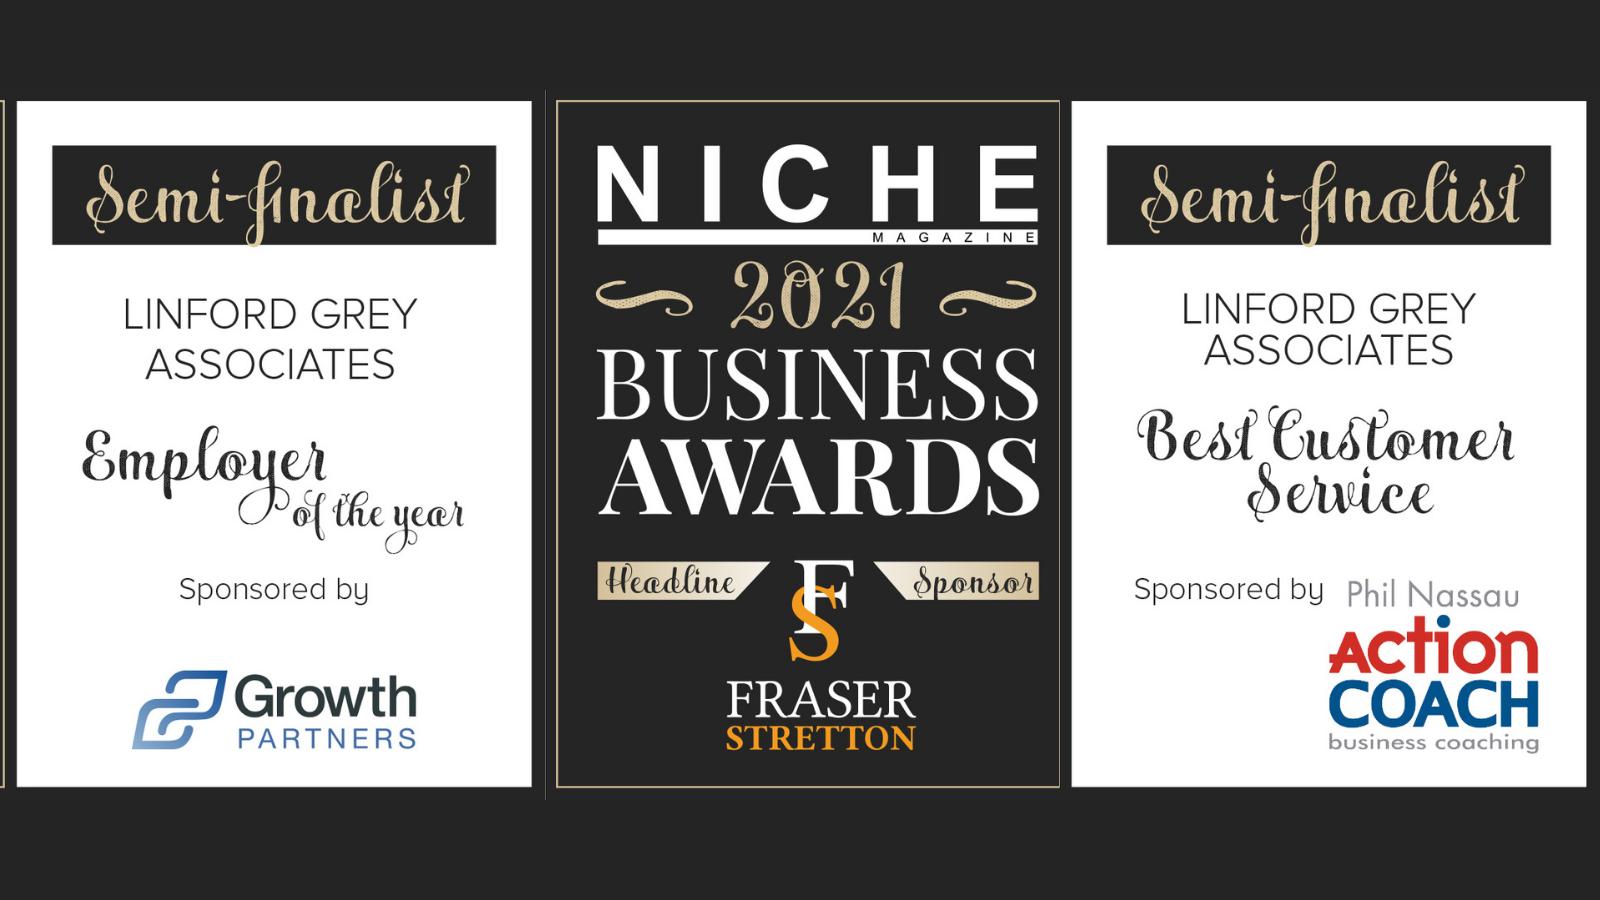 Niche Business Awards Semi-Finalists 2021